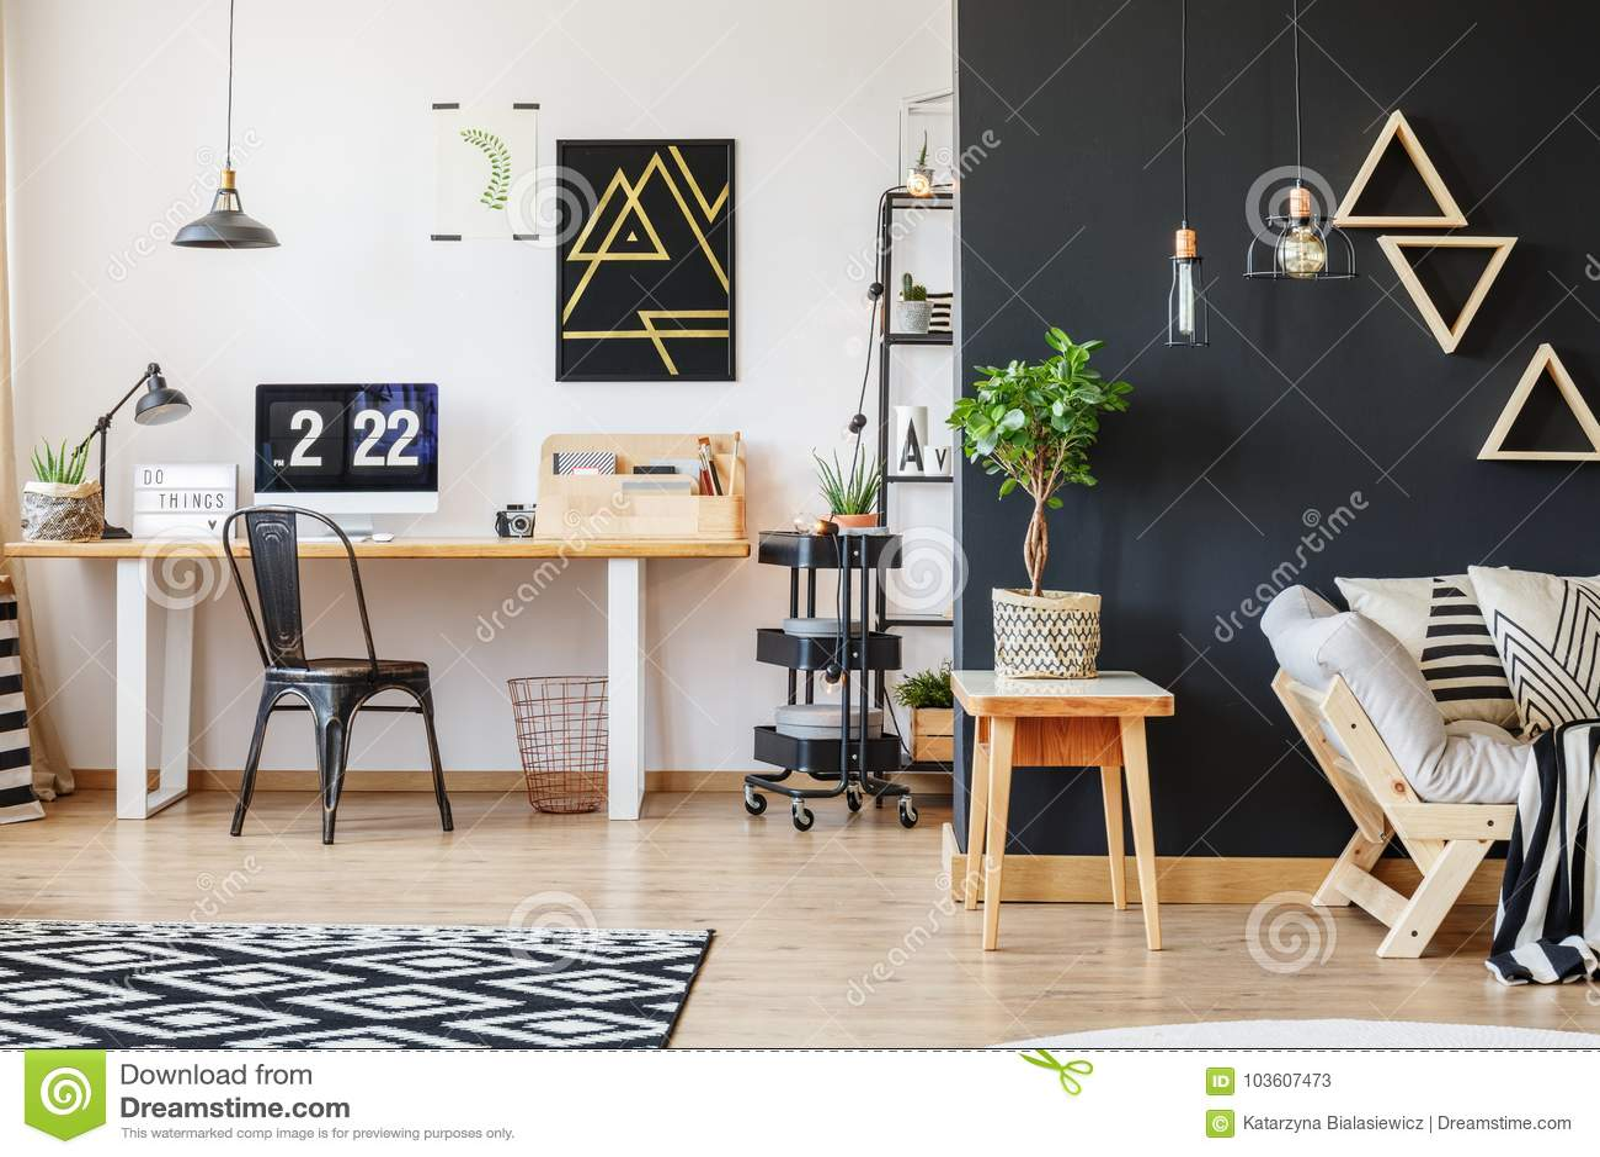 Creative workspace with triangle motive